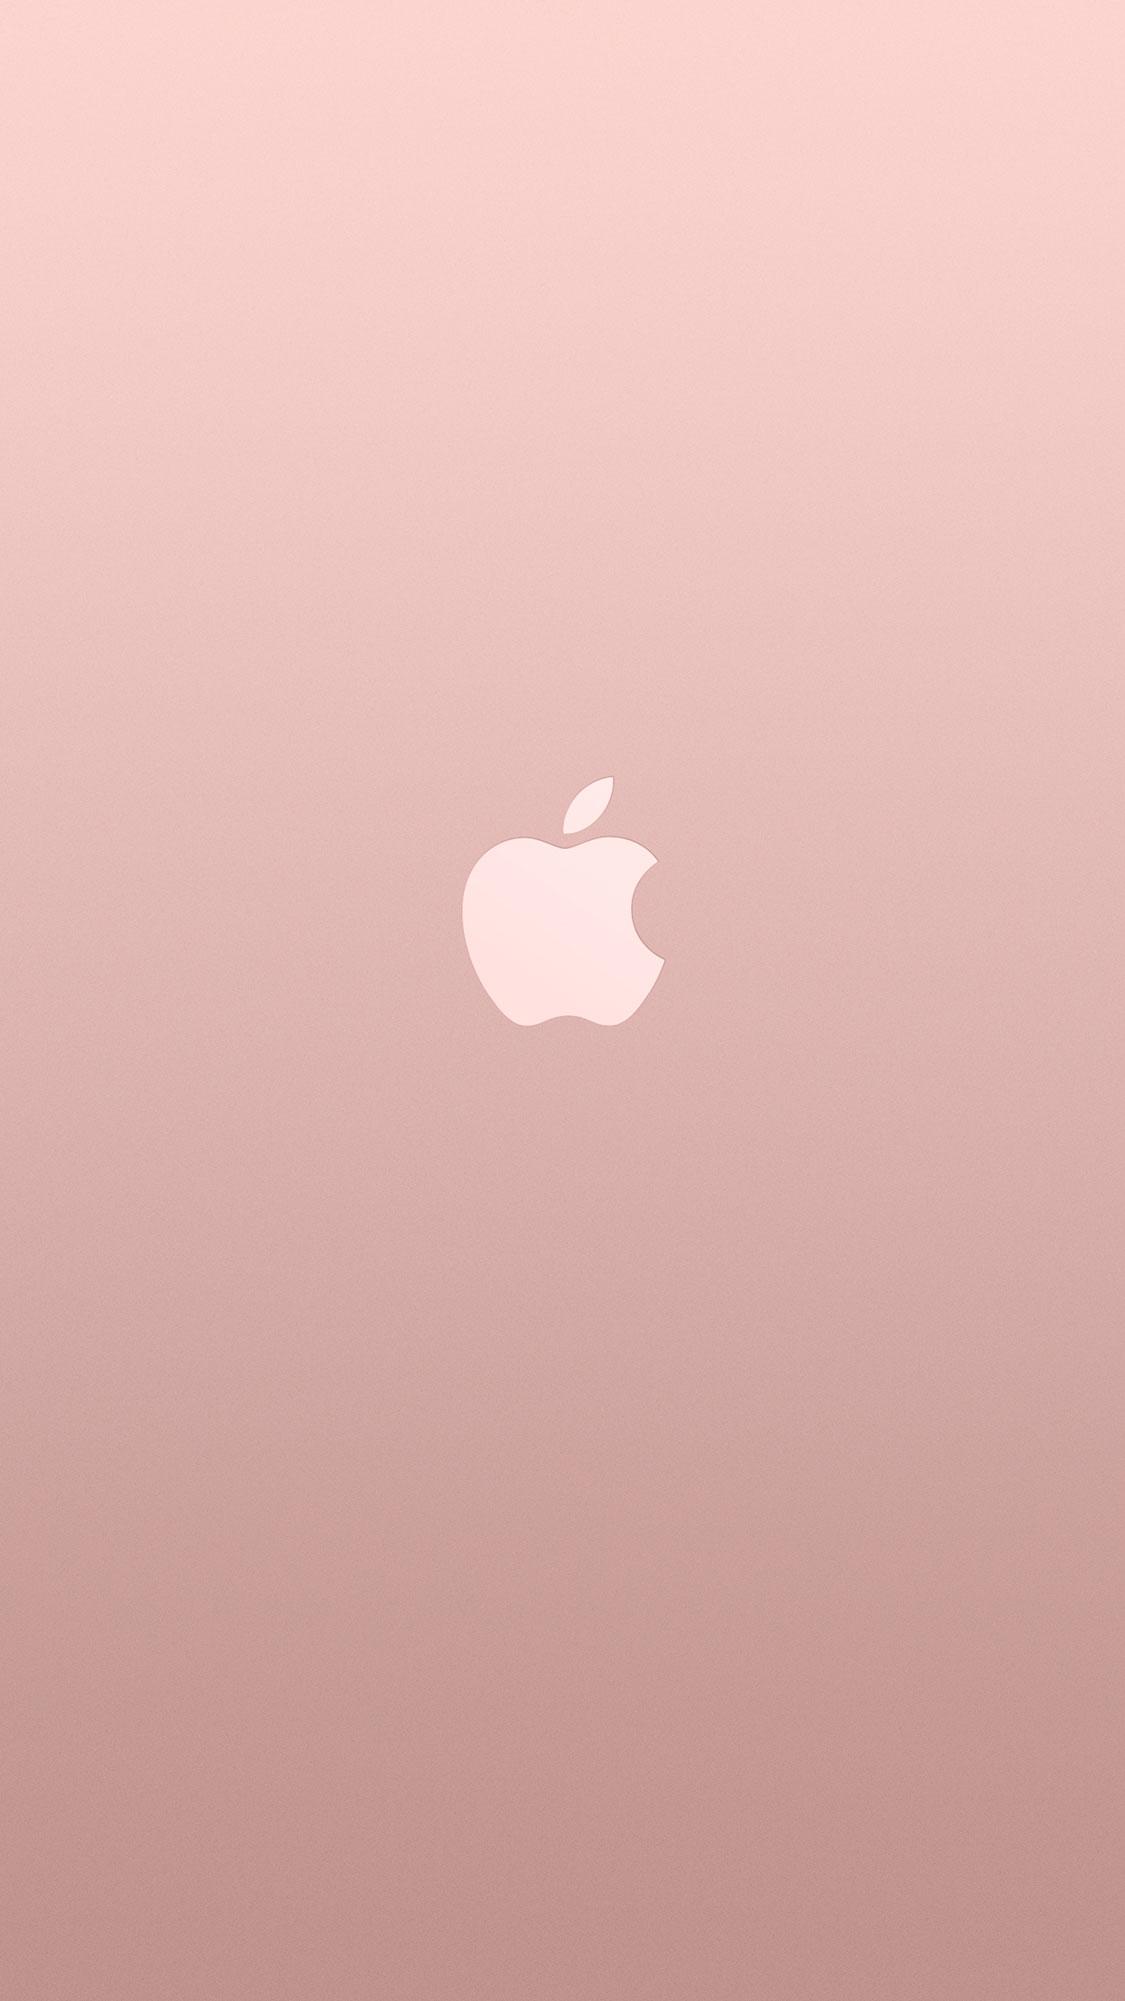 Gold Apple iPhone 6s wallpaper HDjpg 11252001 iPHONE WALLPAPERS 1125x2001